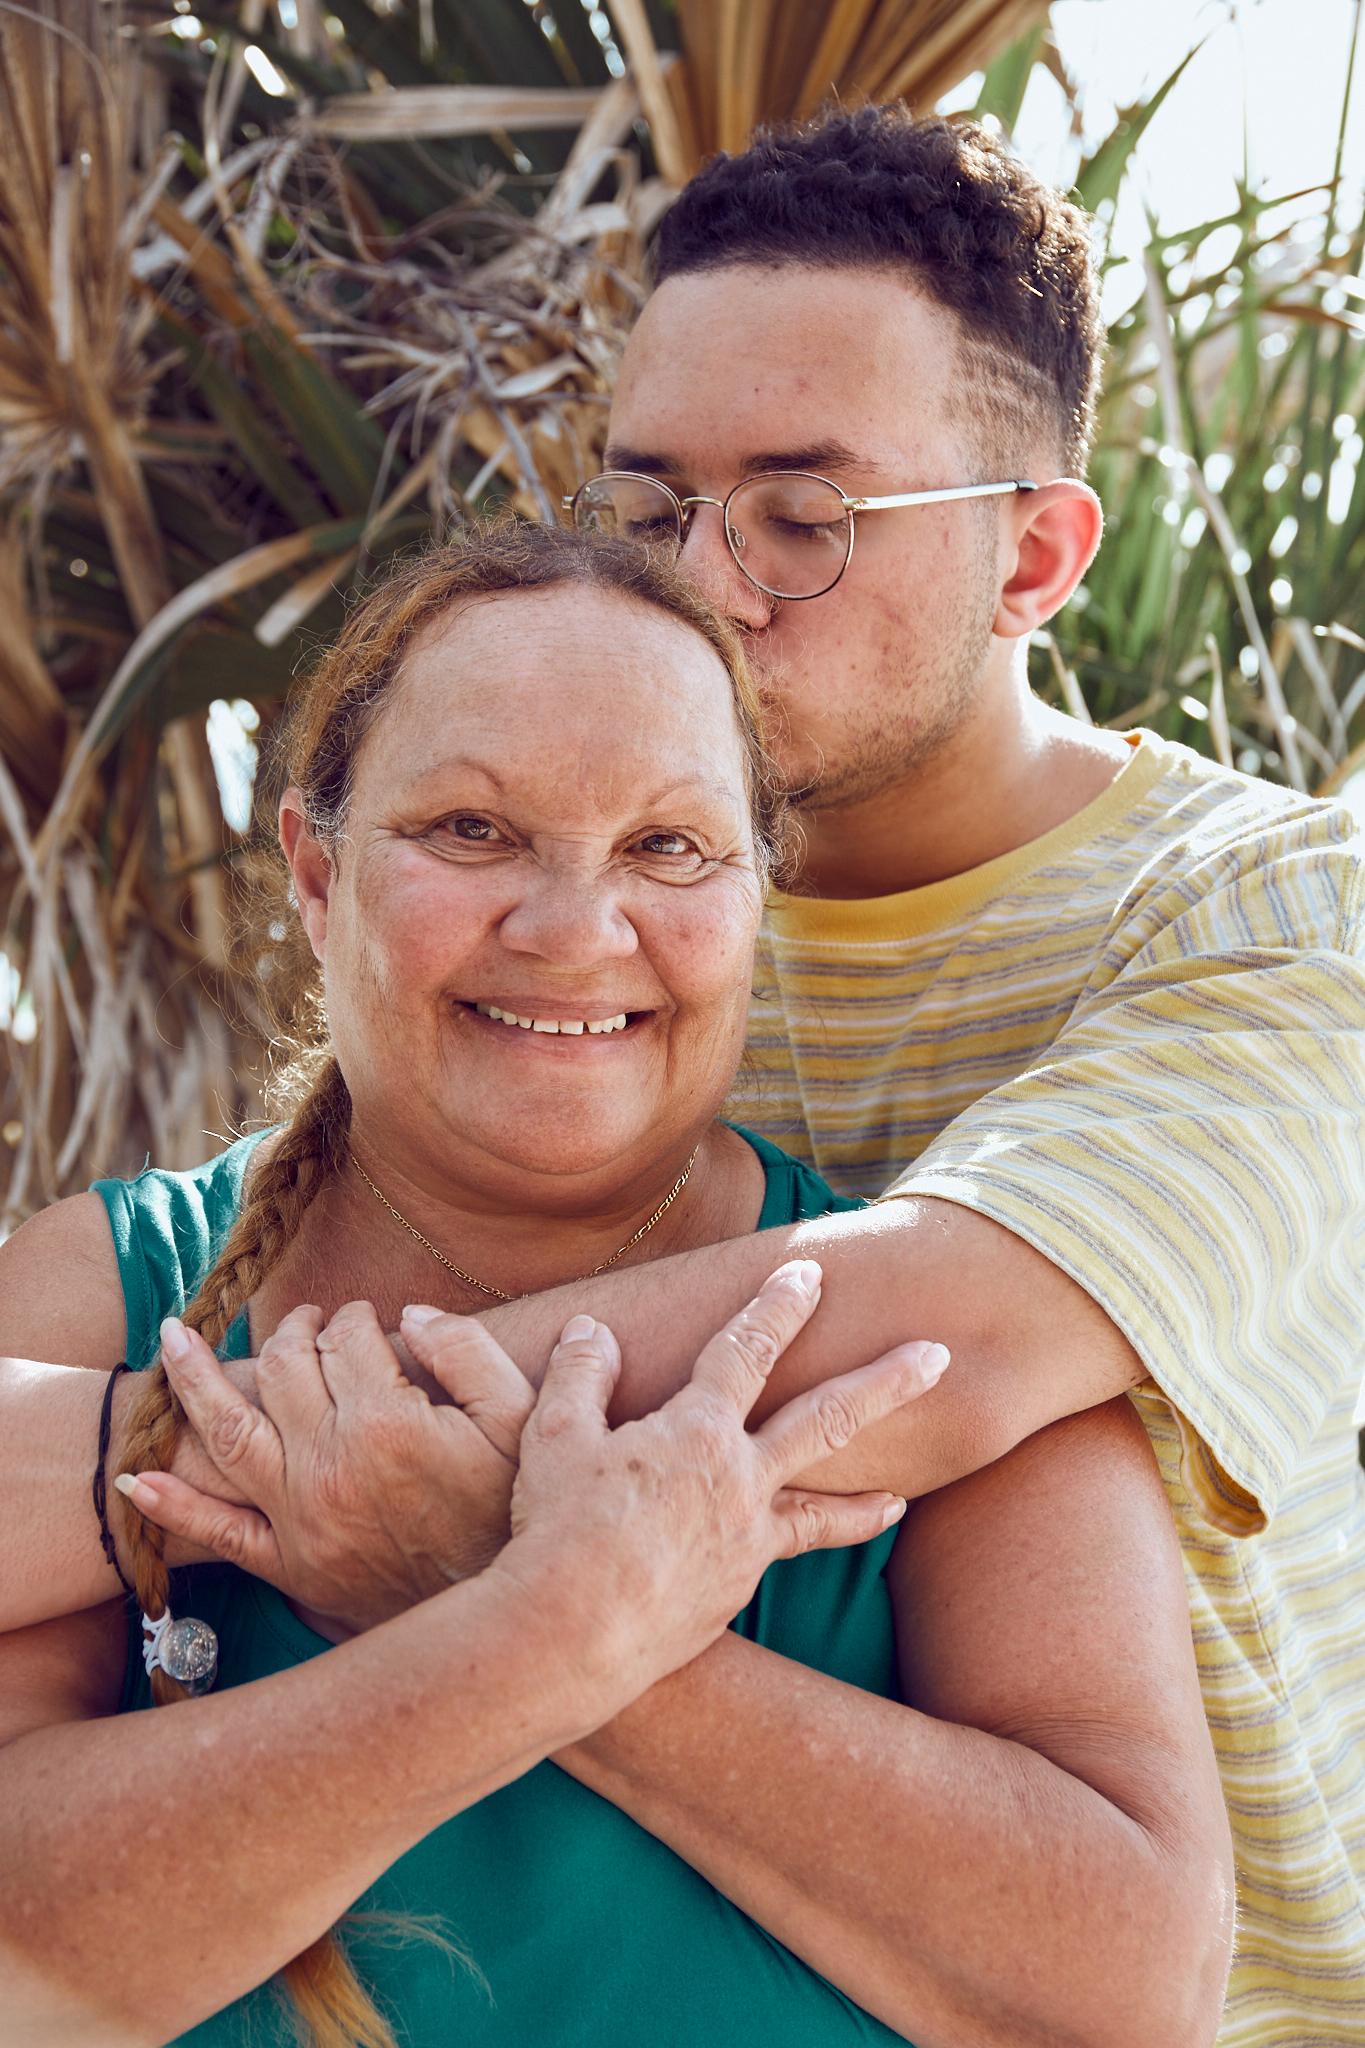 SANTIAGO_FAMILY 167-HI RES.jpg